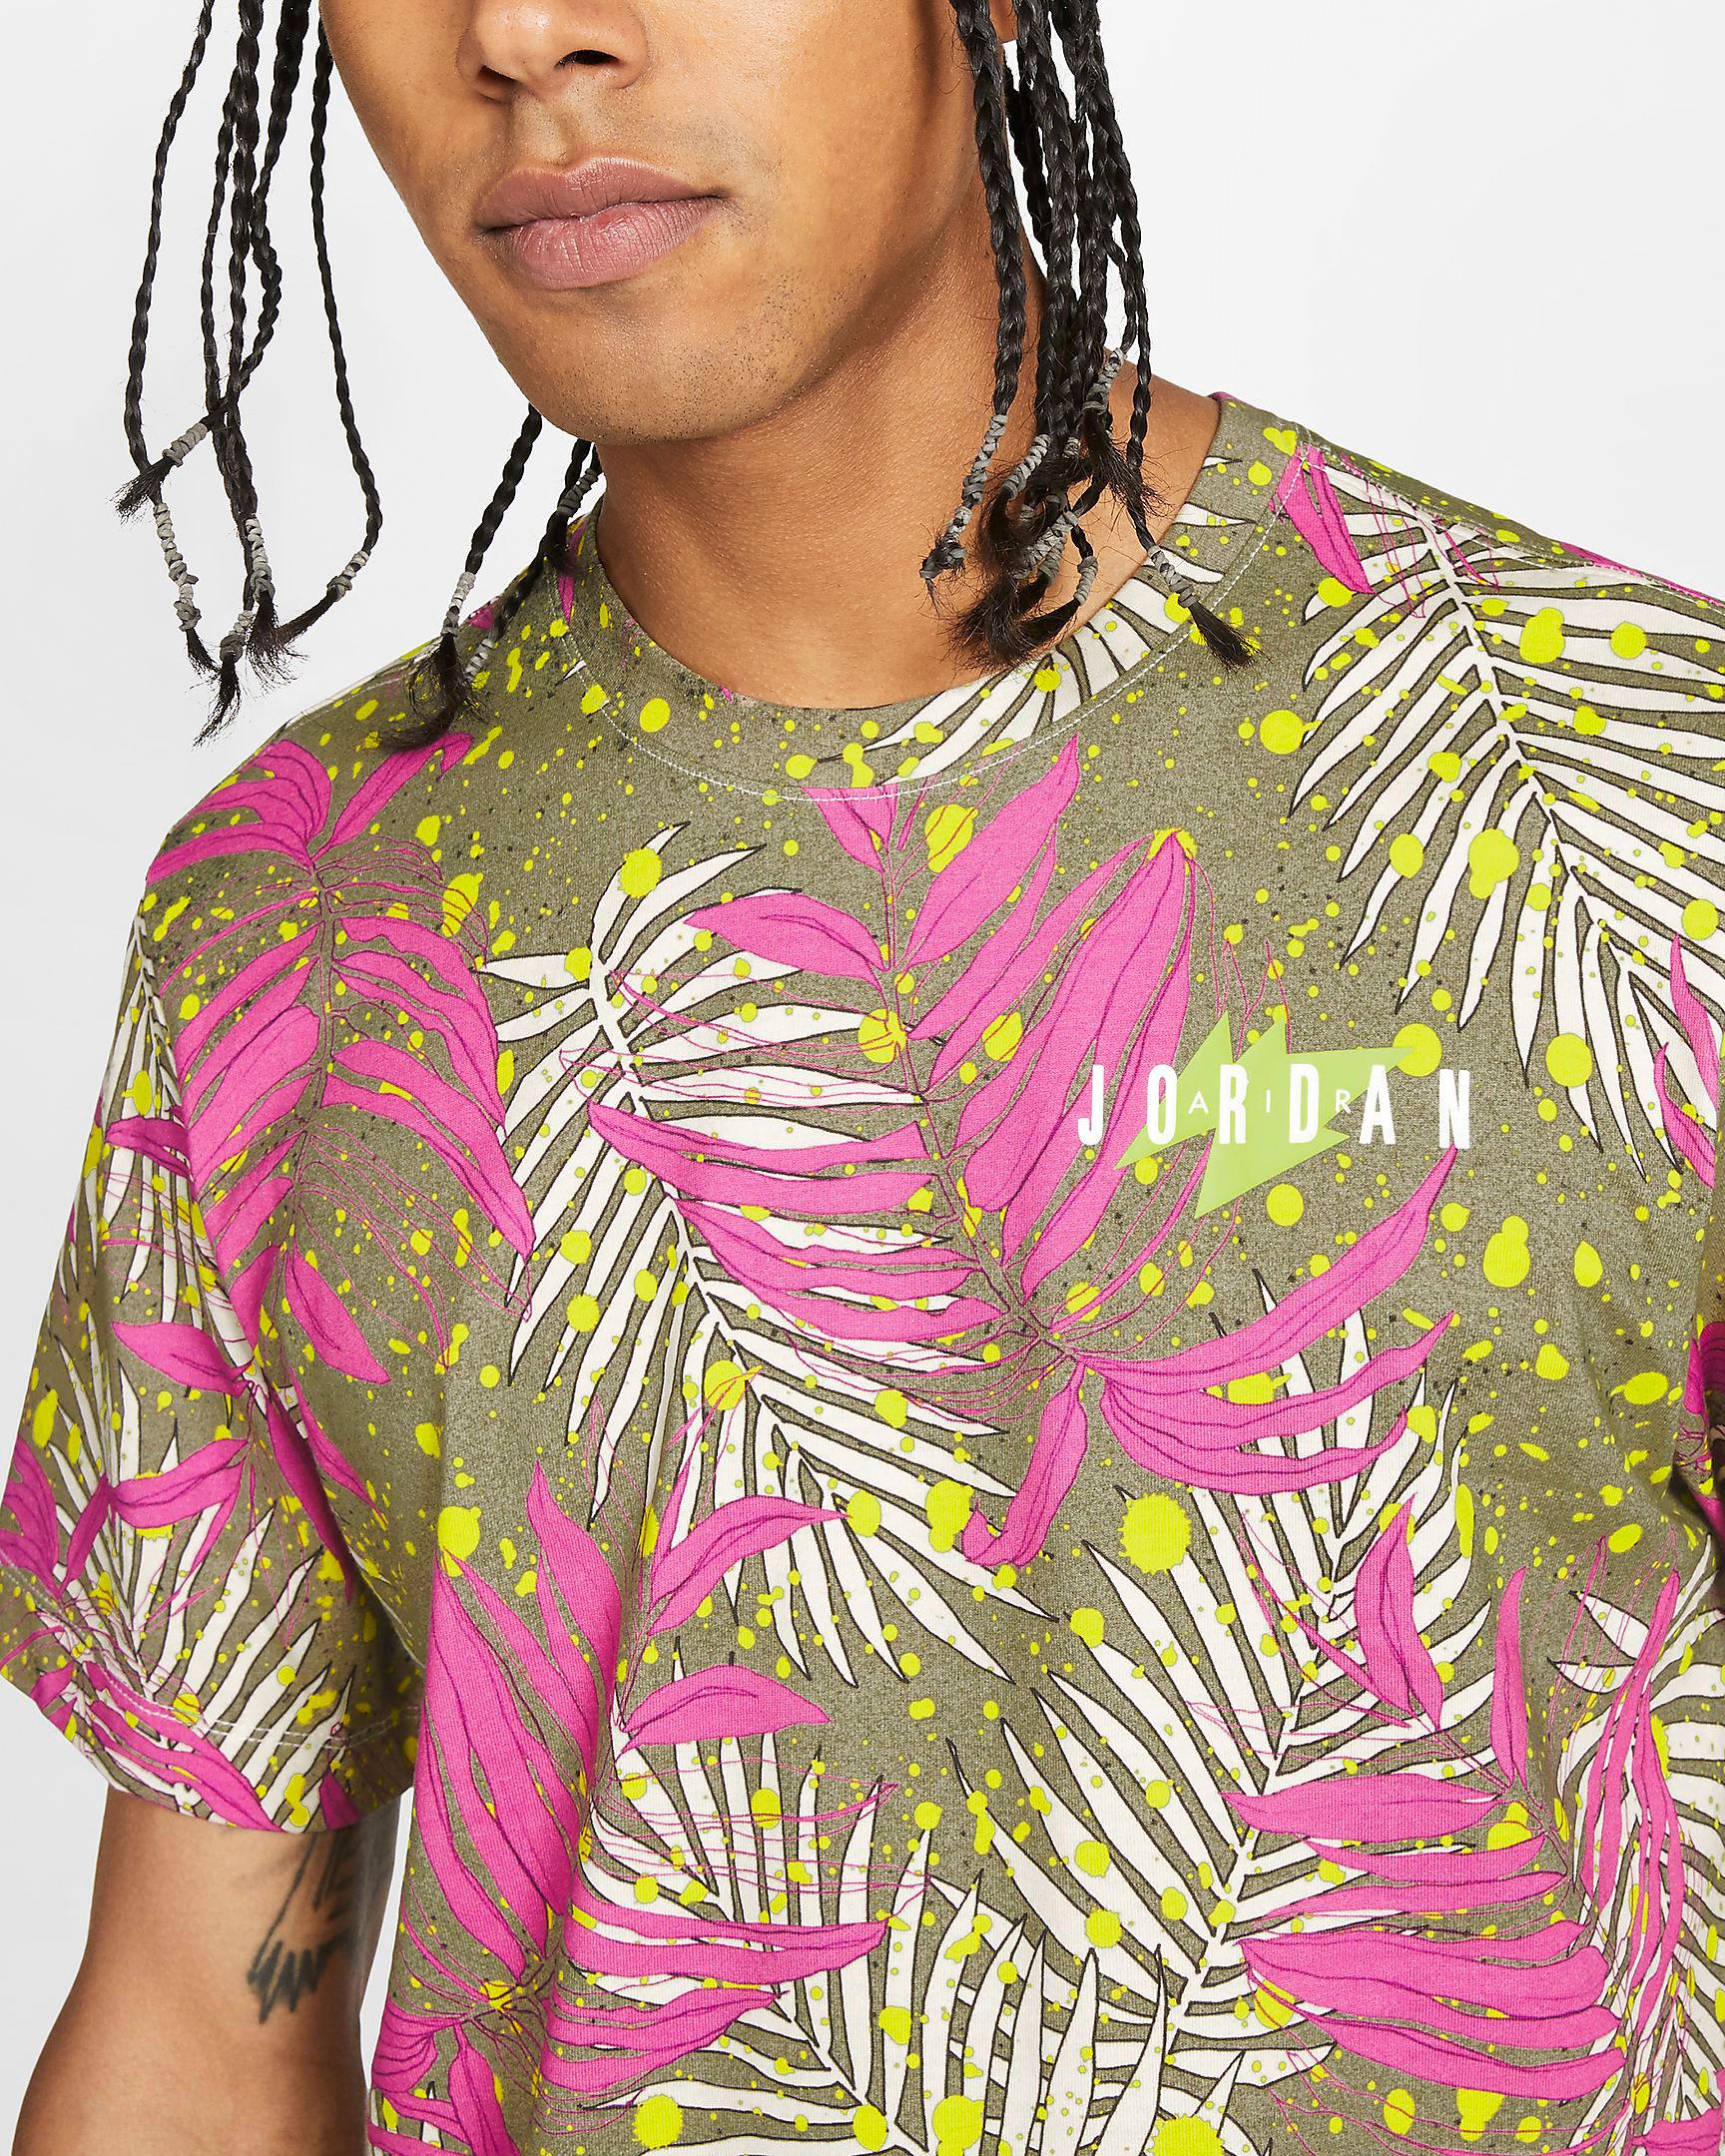 jordan-5-bel-air-alternate-matching-shirt